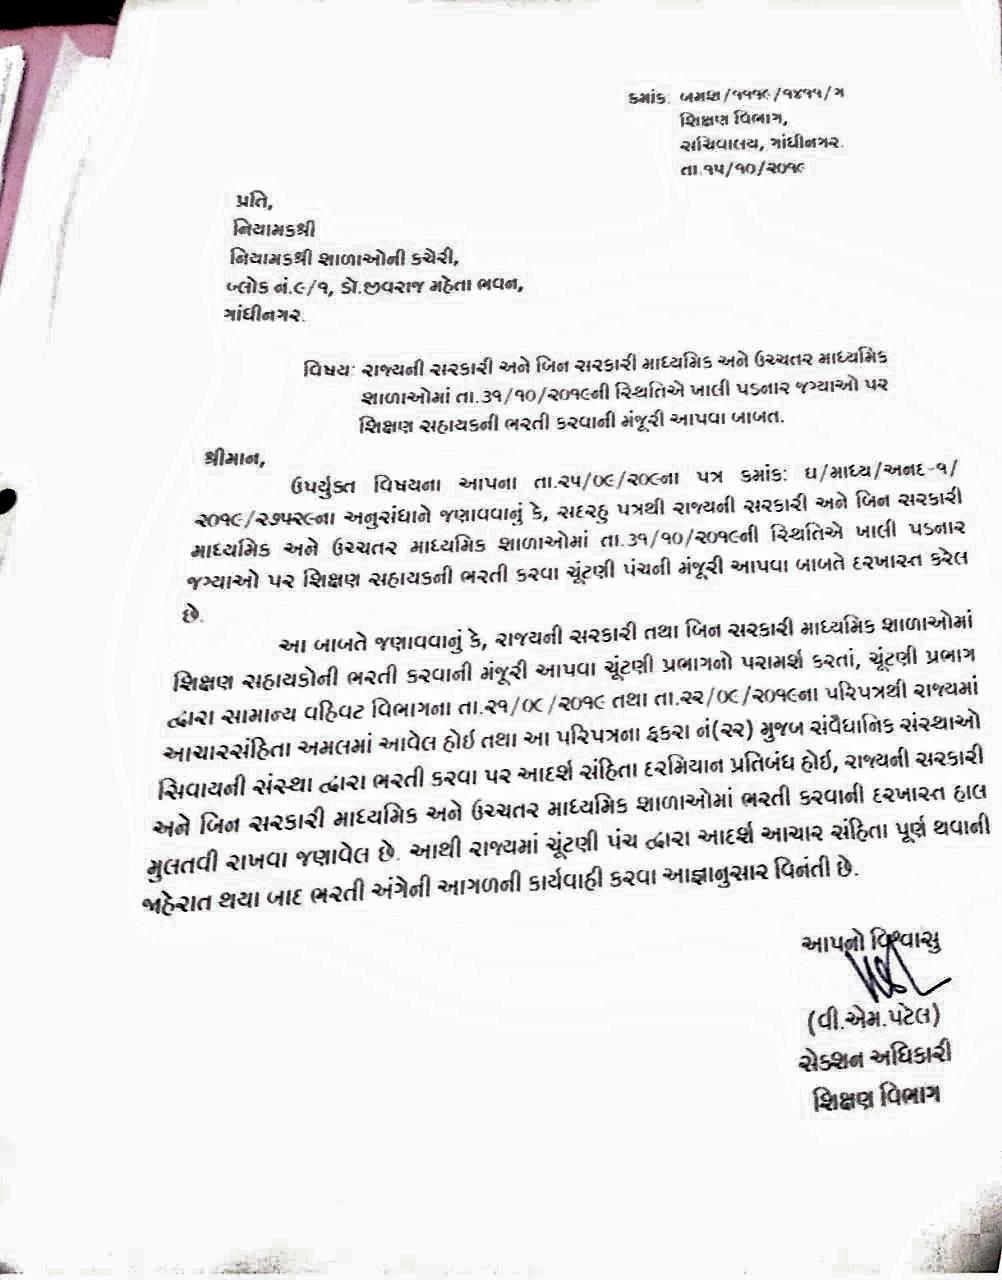 SECONDARY ANE HIGHER SECONDARY BHARTI RELATED CIRCULAR